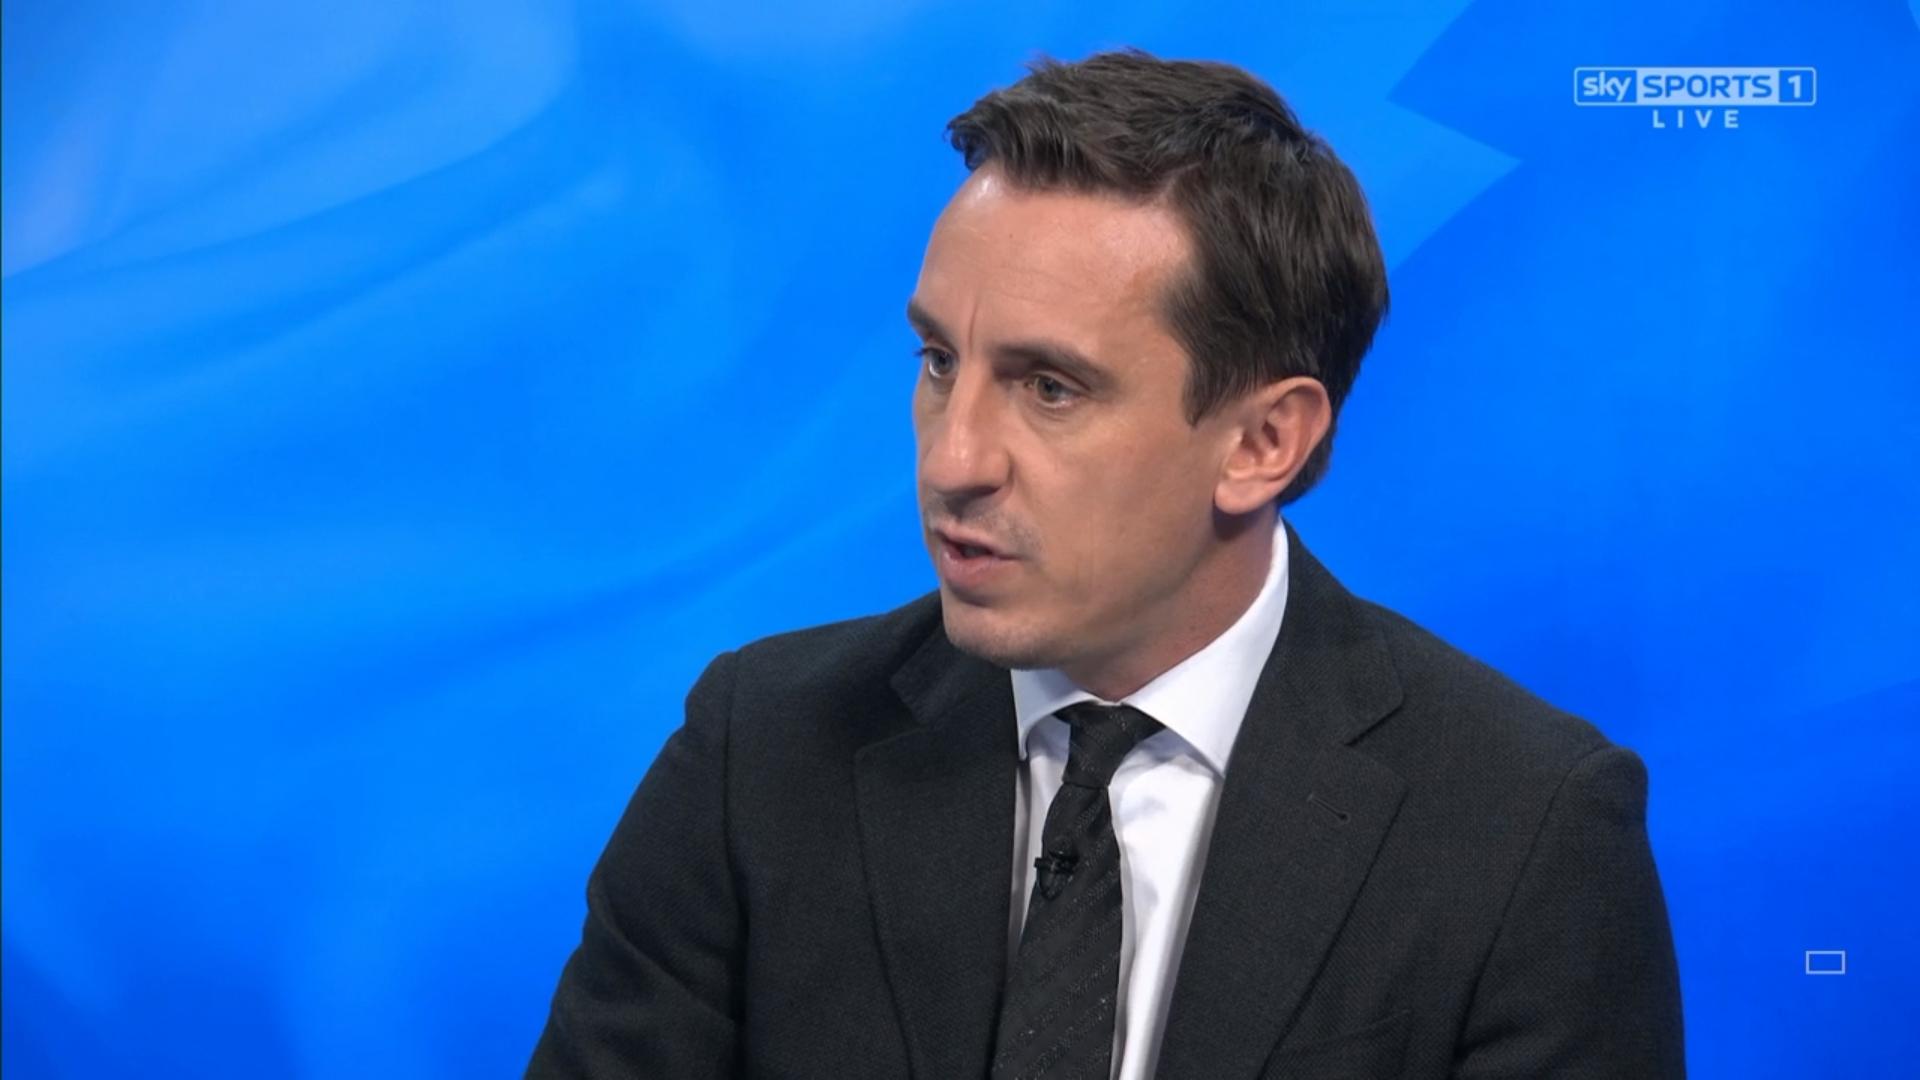 Gary Neville - Sky Sports Football Commentator (13)